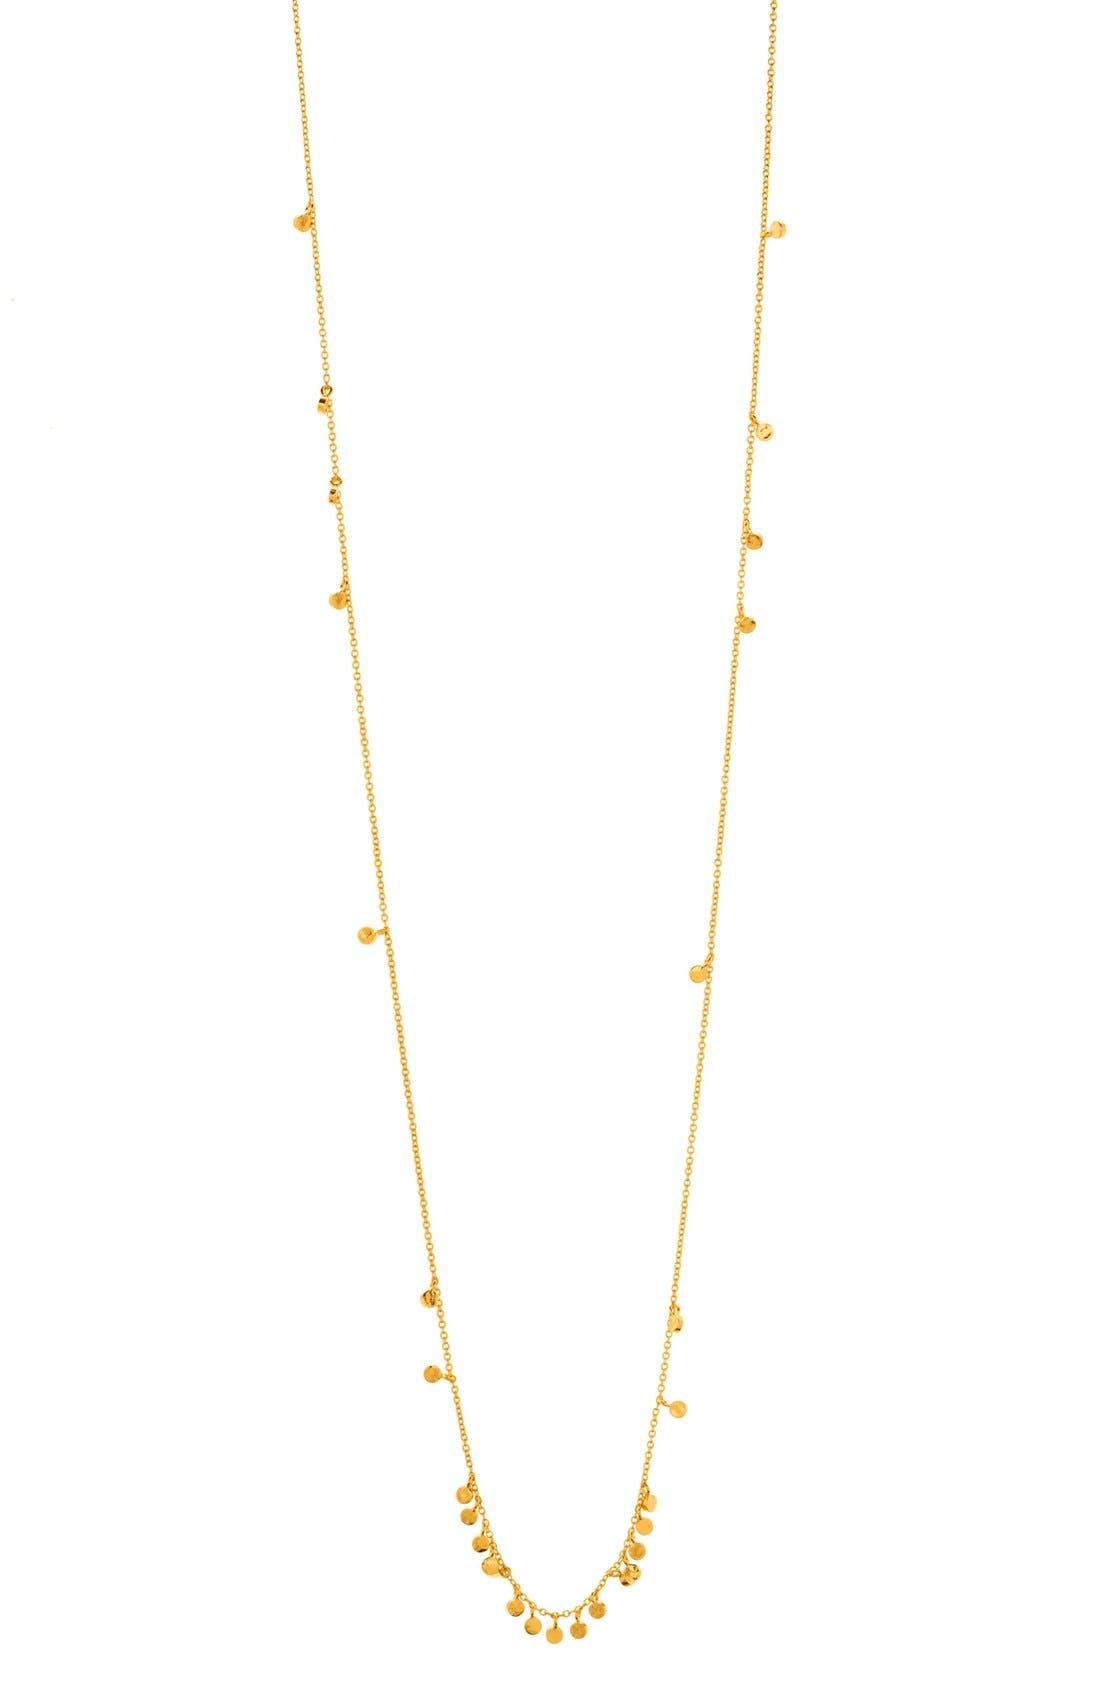 Alternate Image 1 Selected - gorjana 'Chloe' Mini Long Necklace